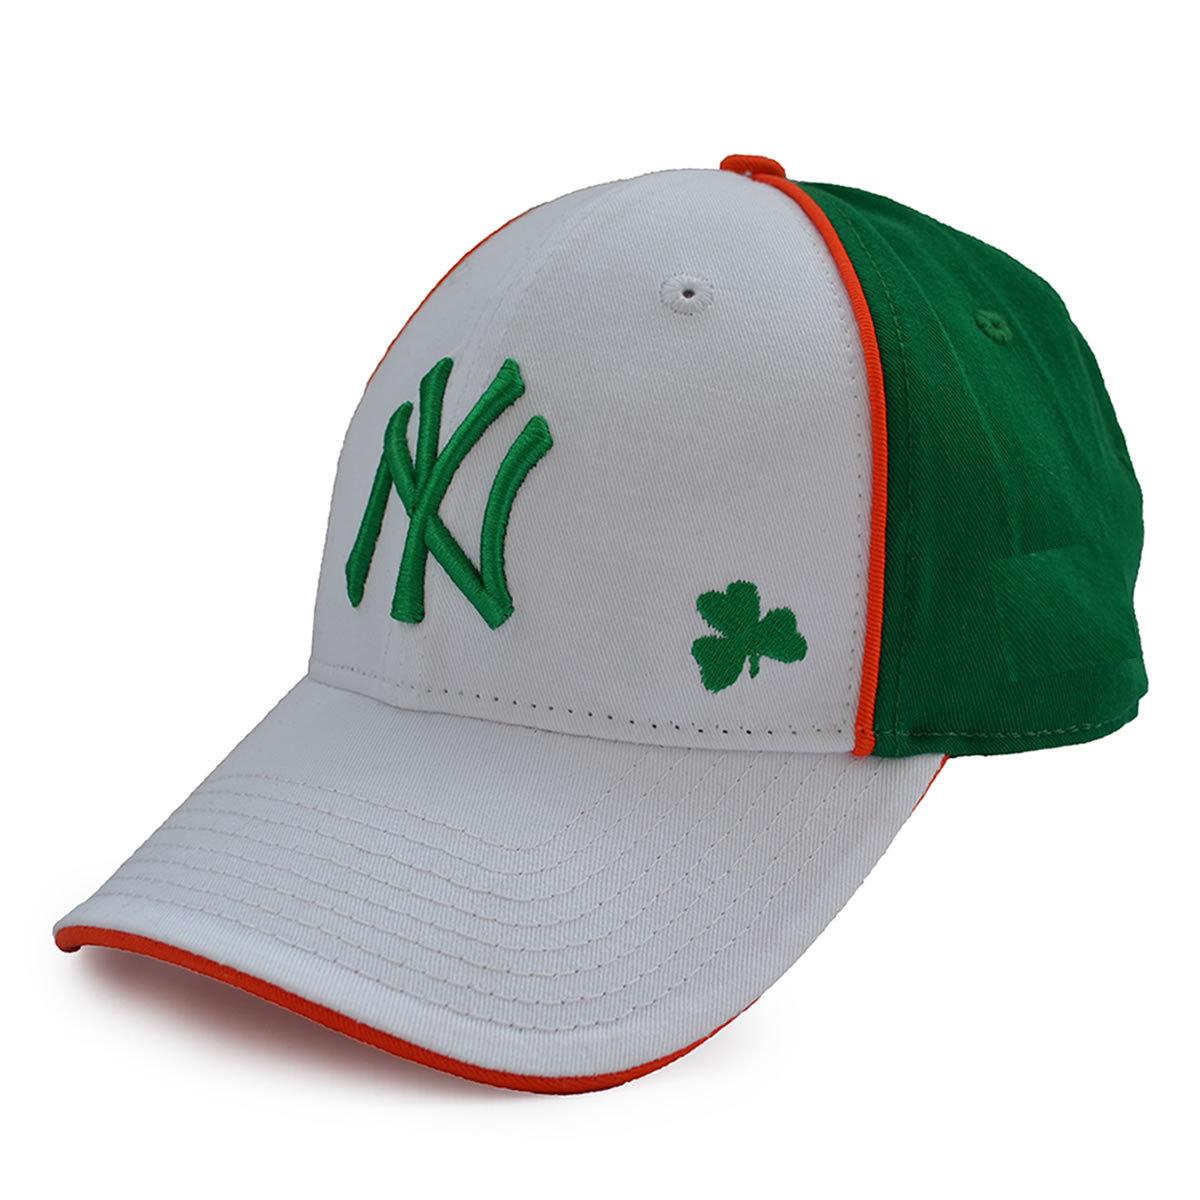 MLB棒球帽子洋基隊新款選什么牌子好 同款好推薦